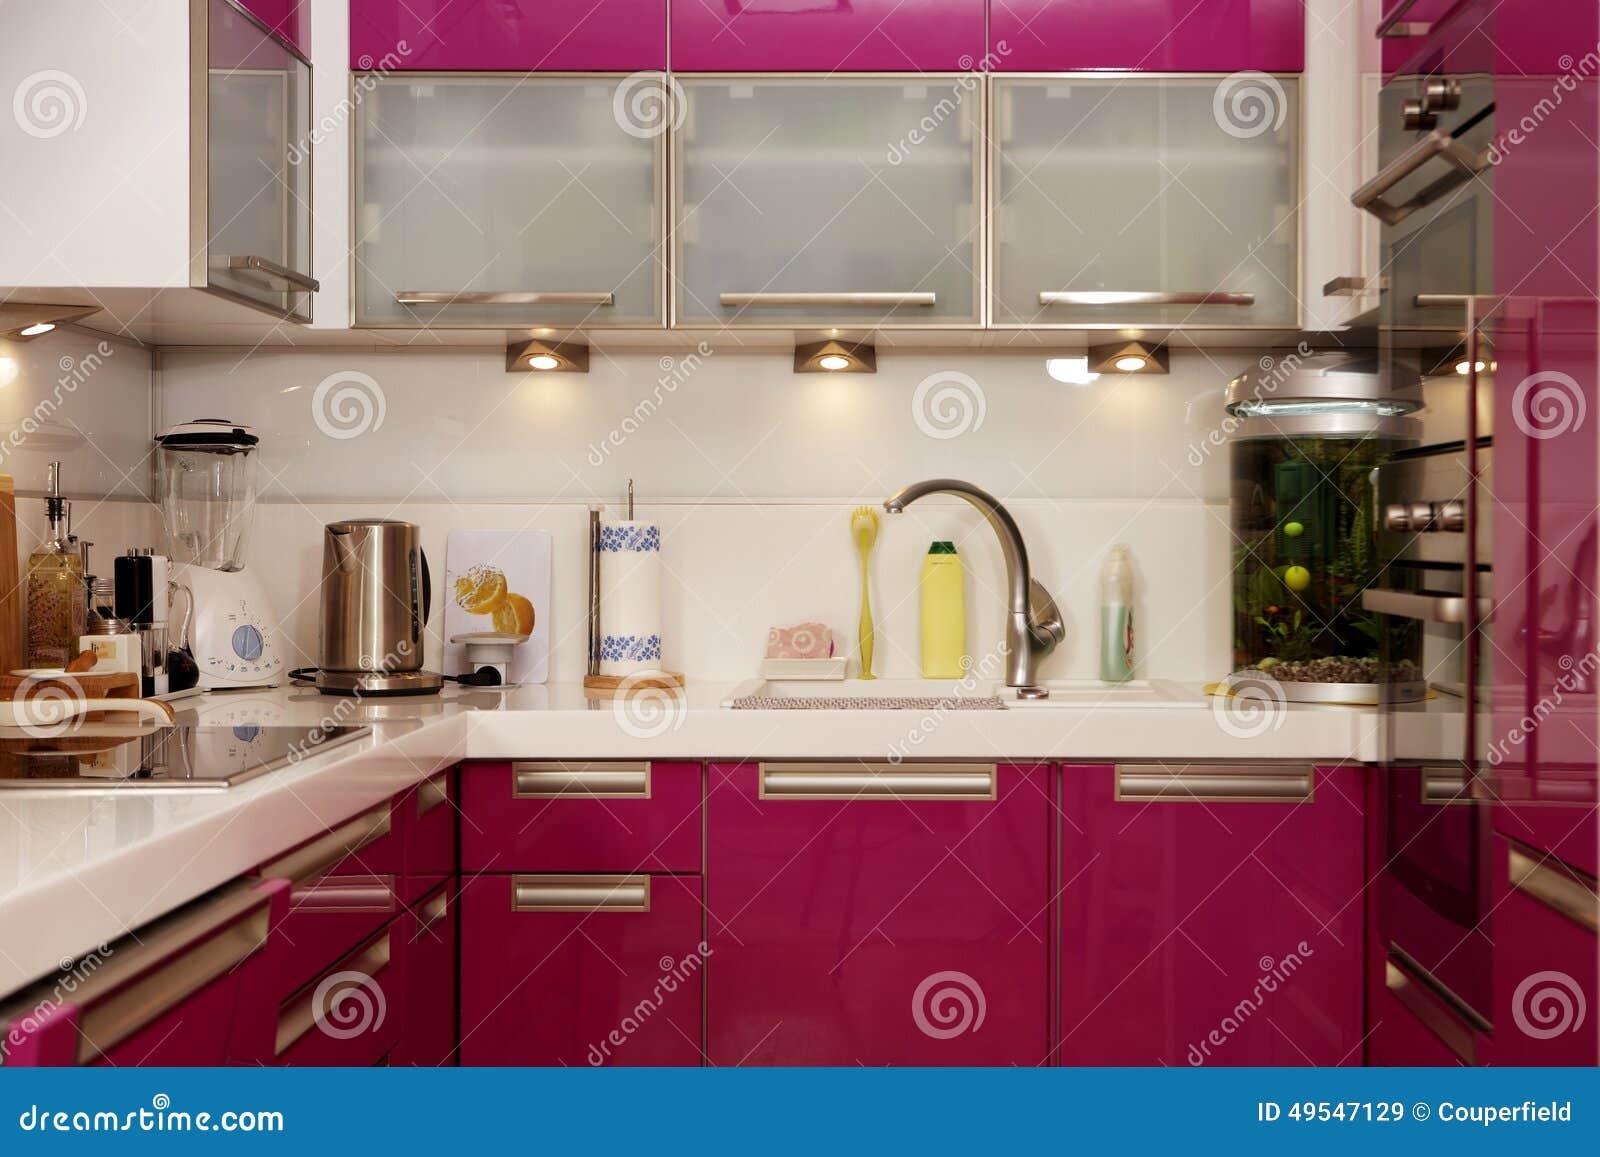 kleine rosa küche redaktionelles stockbild - bild: 49547129